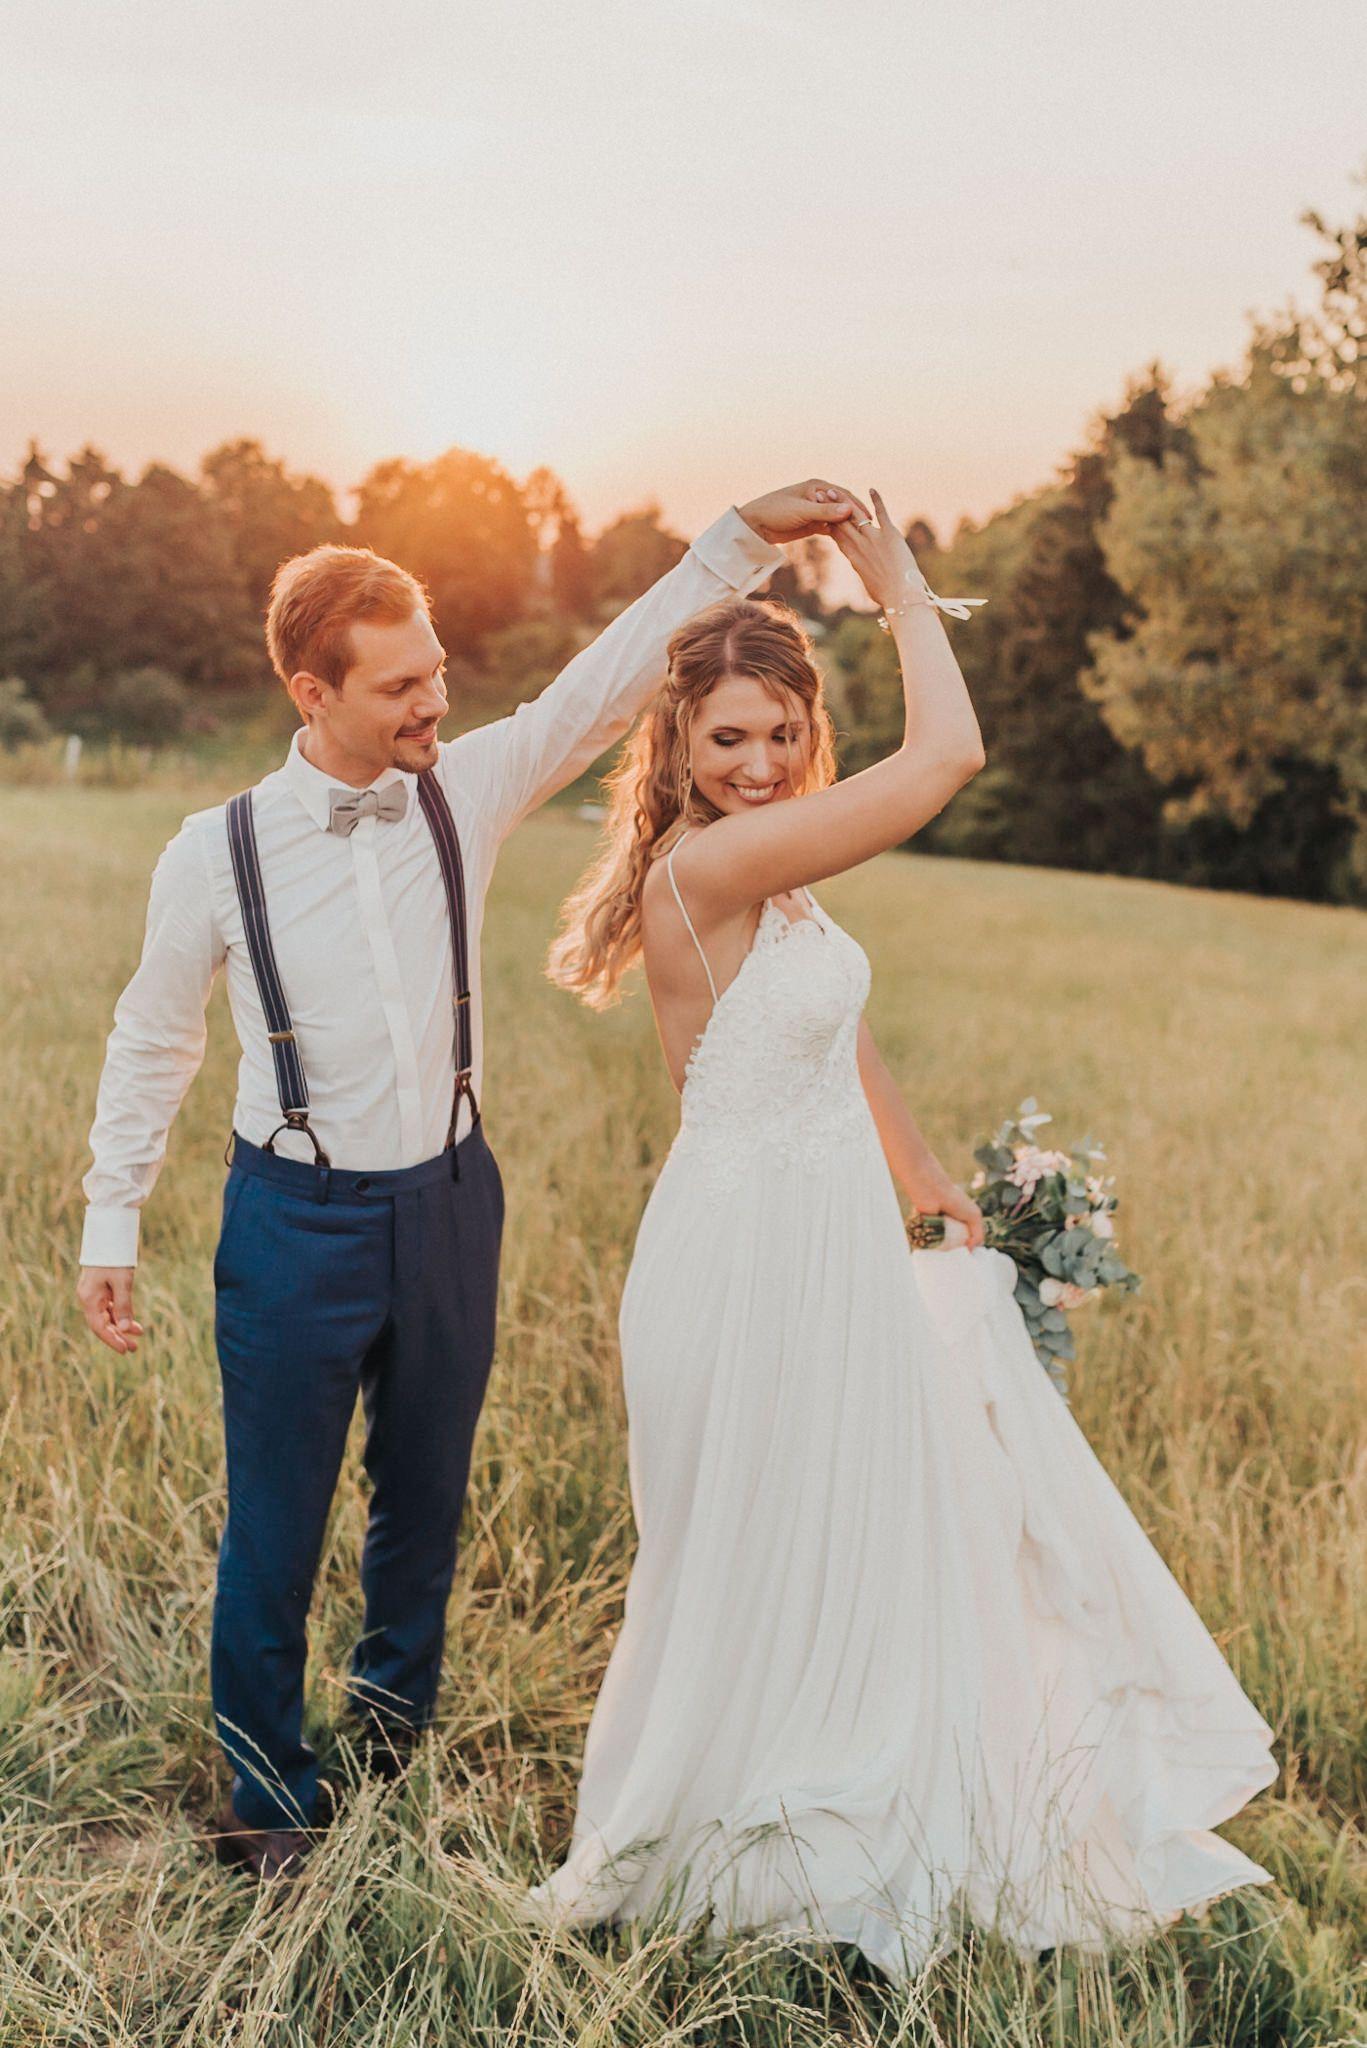 Boda | Jana Stening | Fotógrafo de bodas Colonia | Fotógrafo de bodas NRW | Alta …